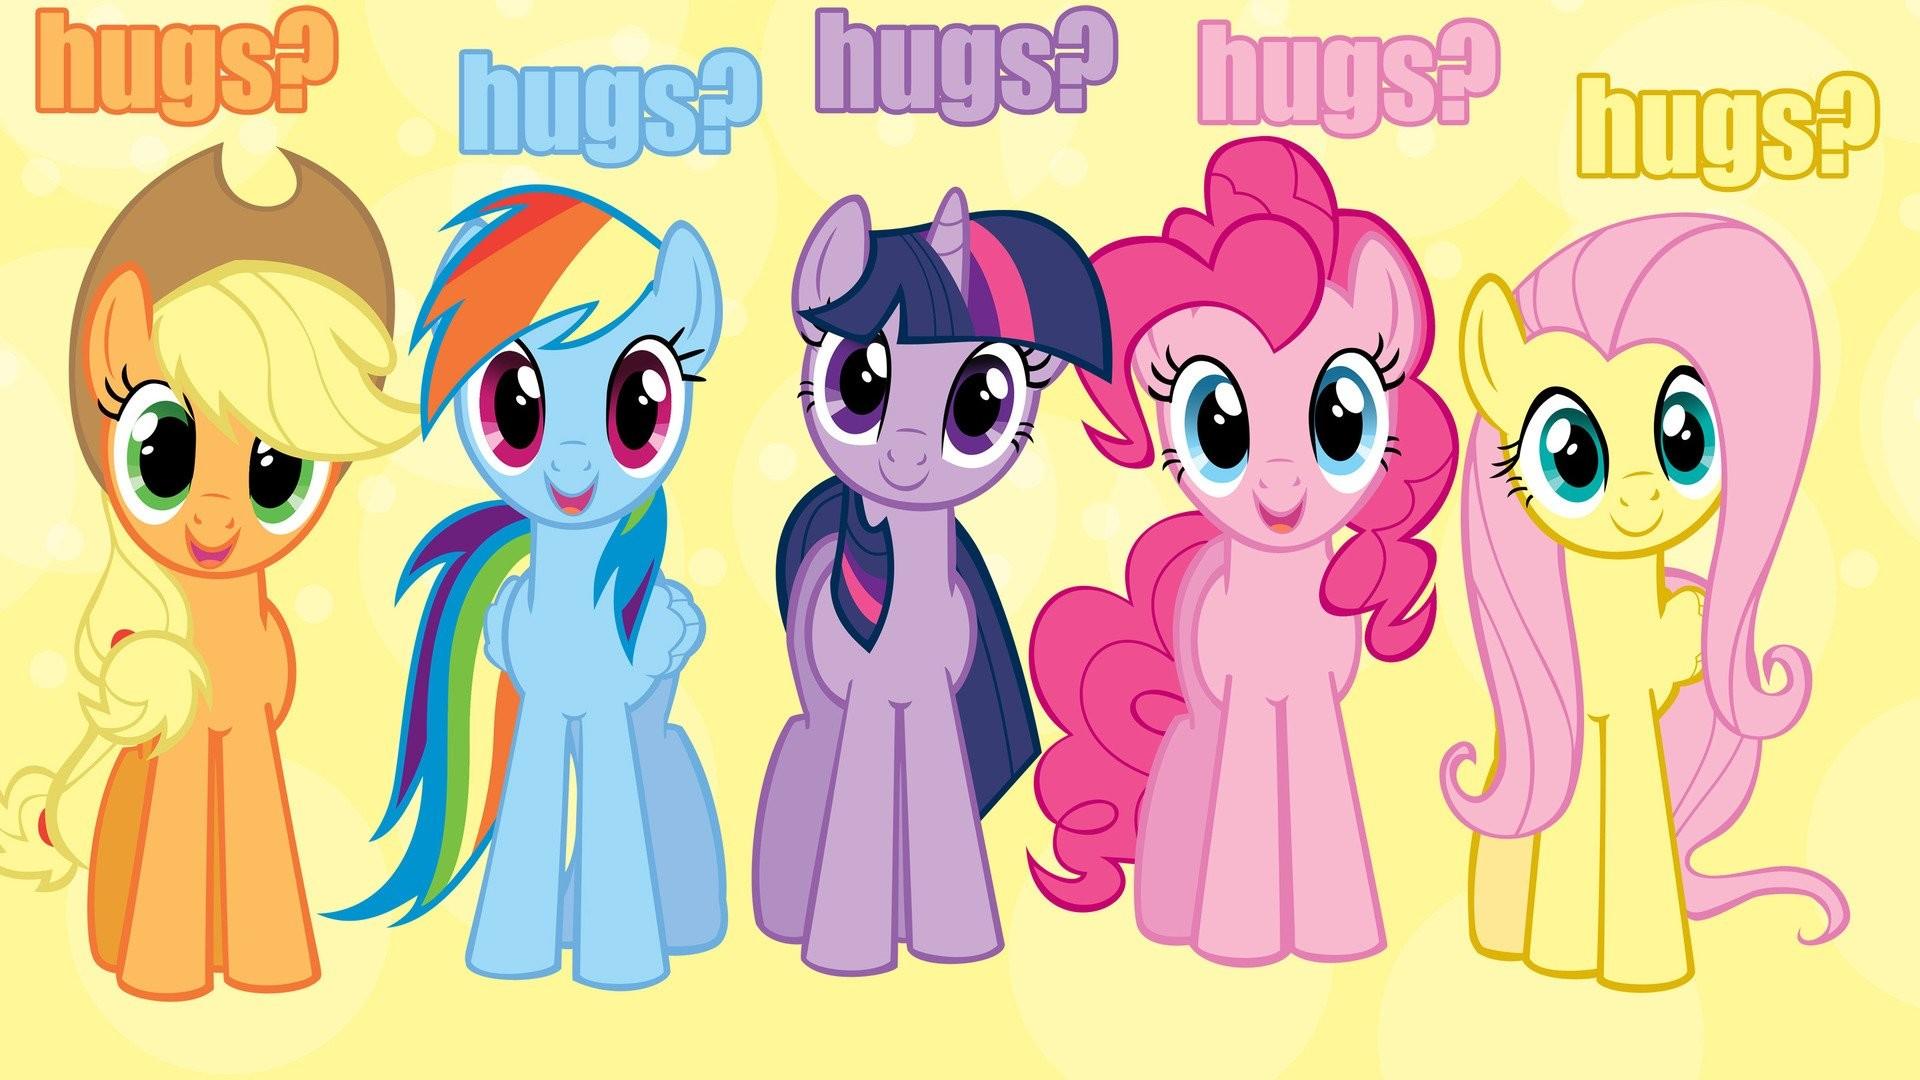 10. my-little-pony-wallpaper-free-Download8-1-600×338